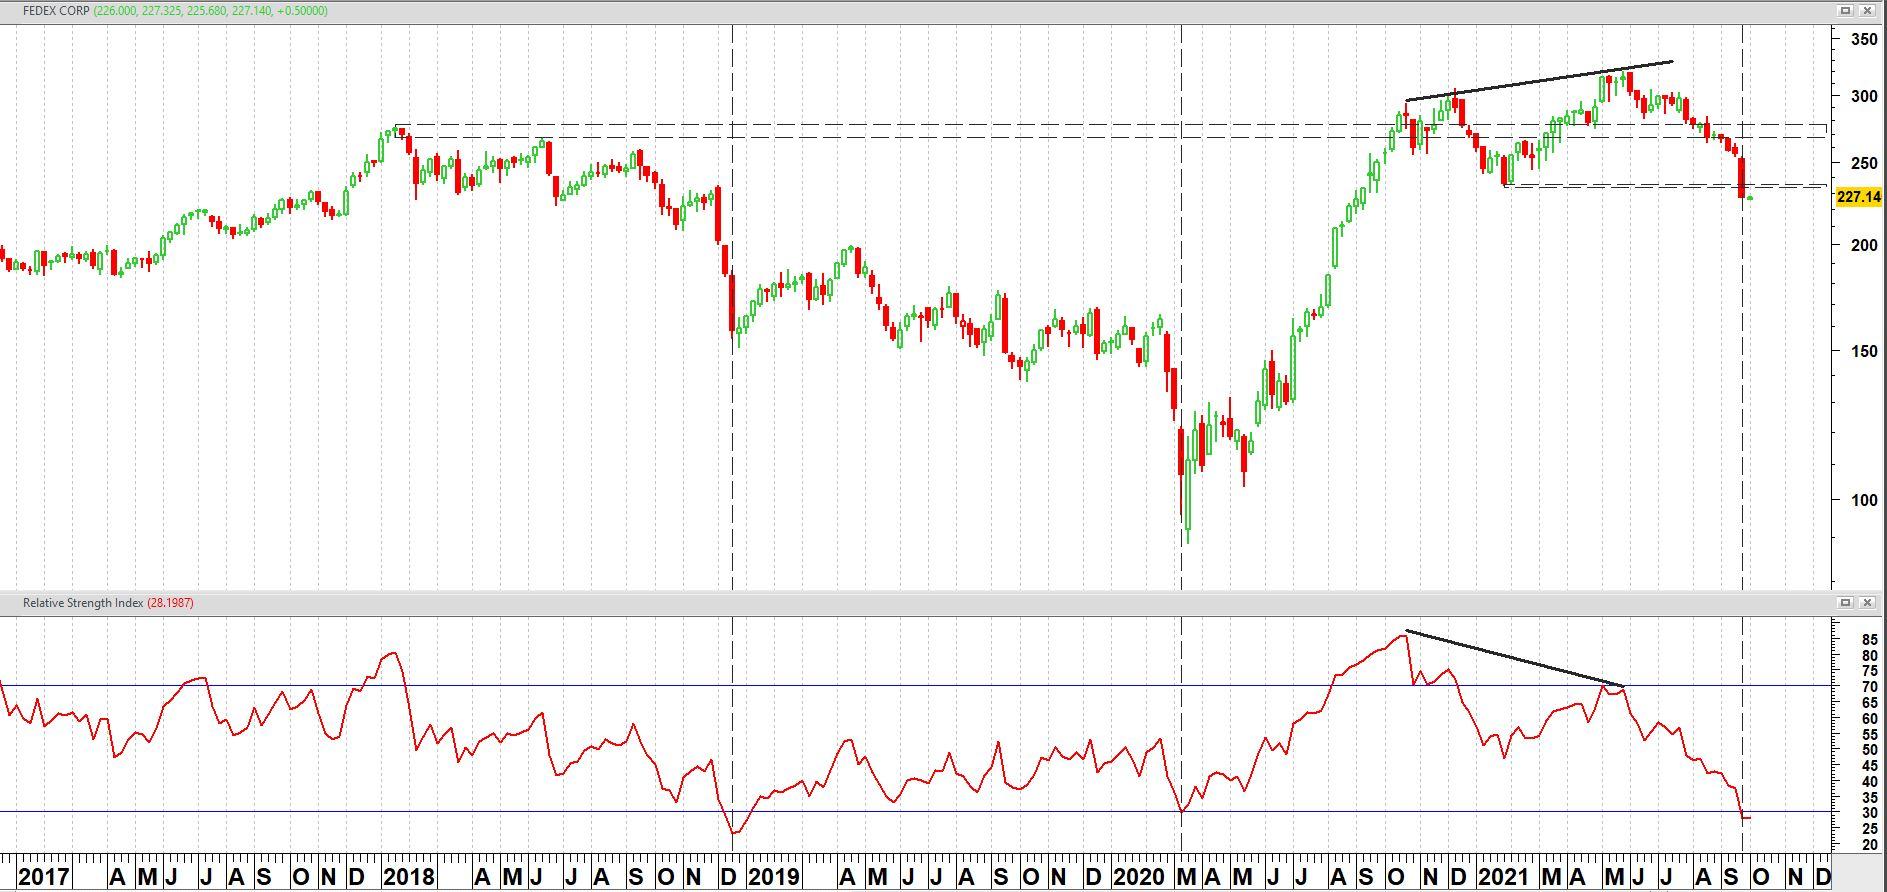 FEDEX (FDX) op weekbasis + relatieve sterkte index (RSI)